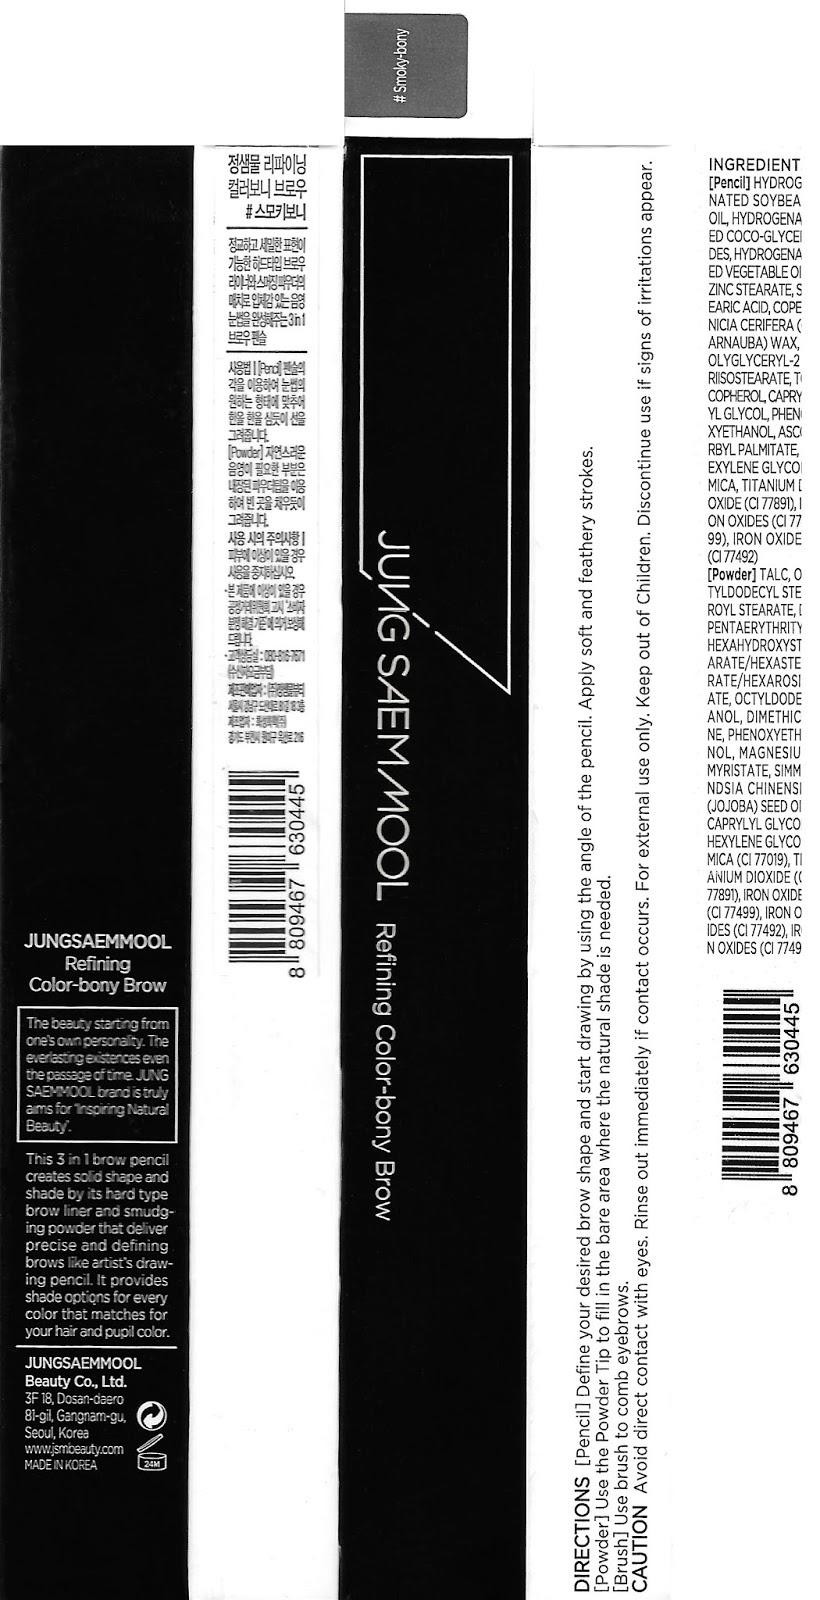 lavlilacs JUNGSAEMMOOL Refining Color-bony Brow - Smoky Bony packaging